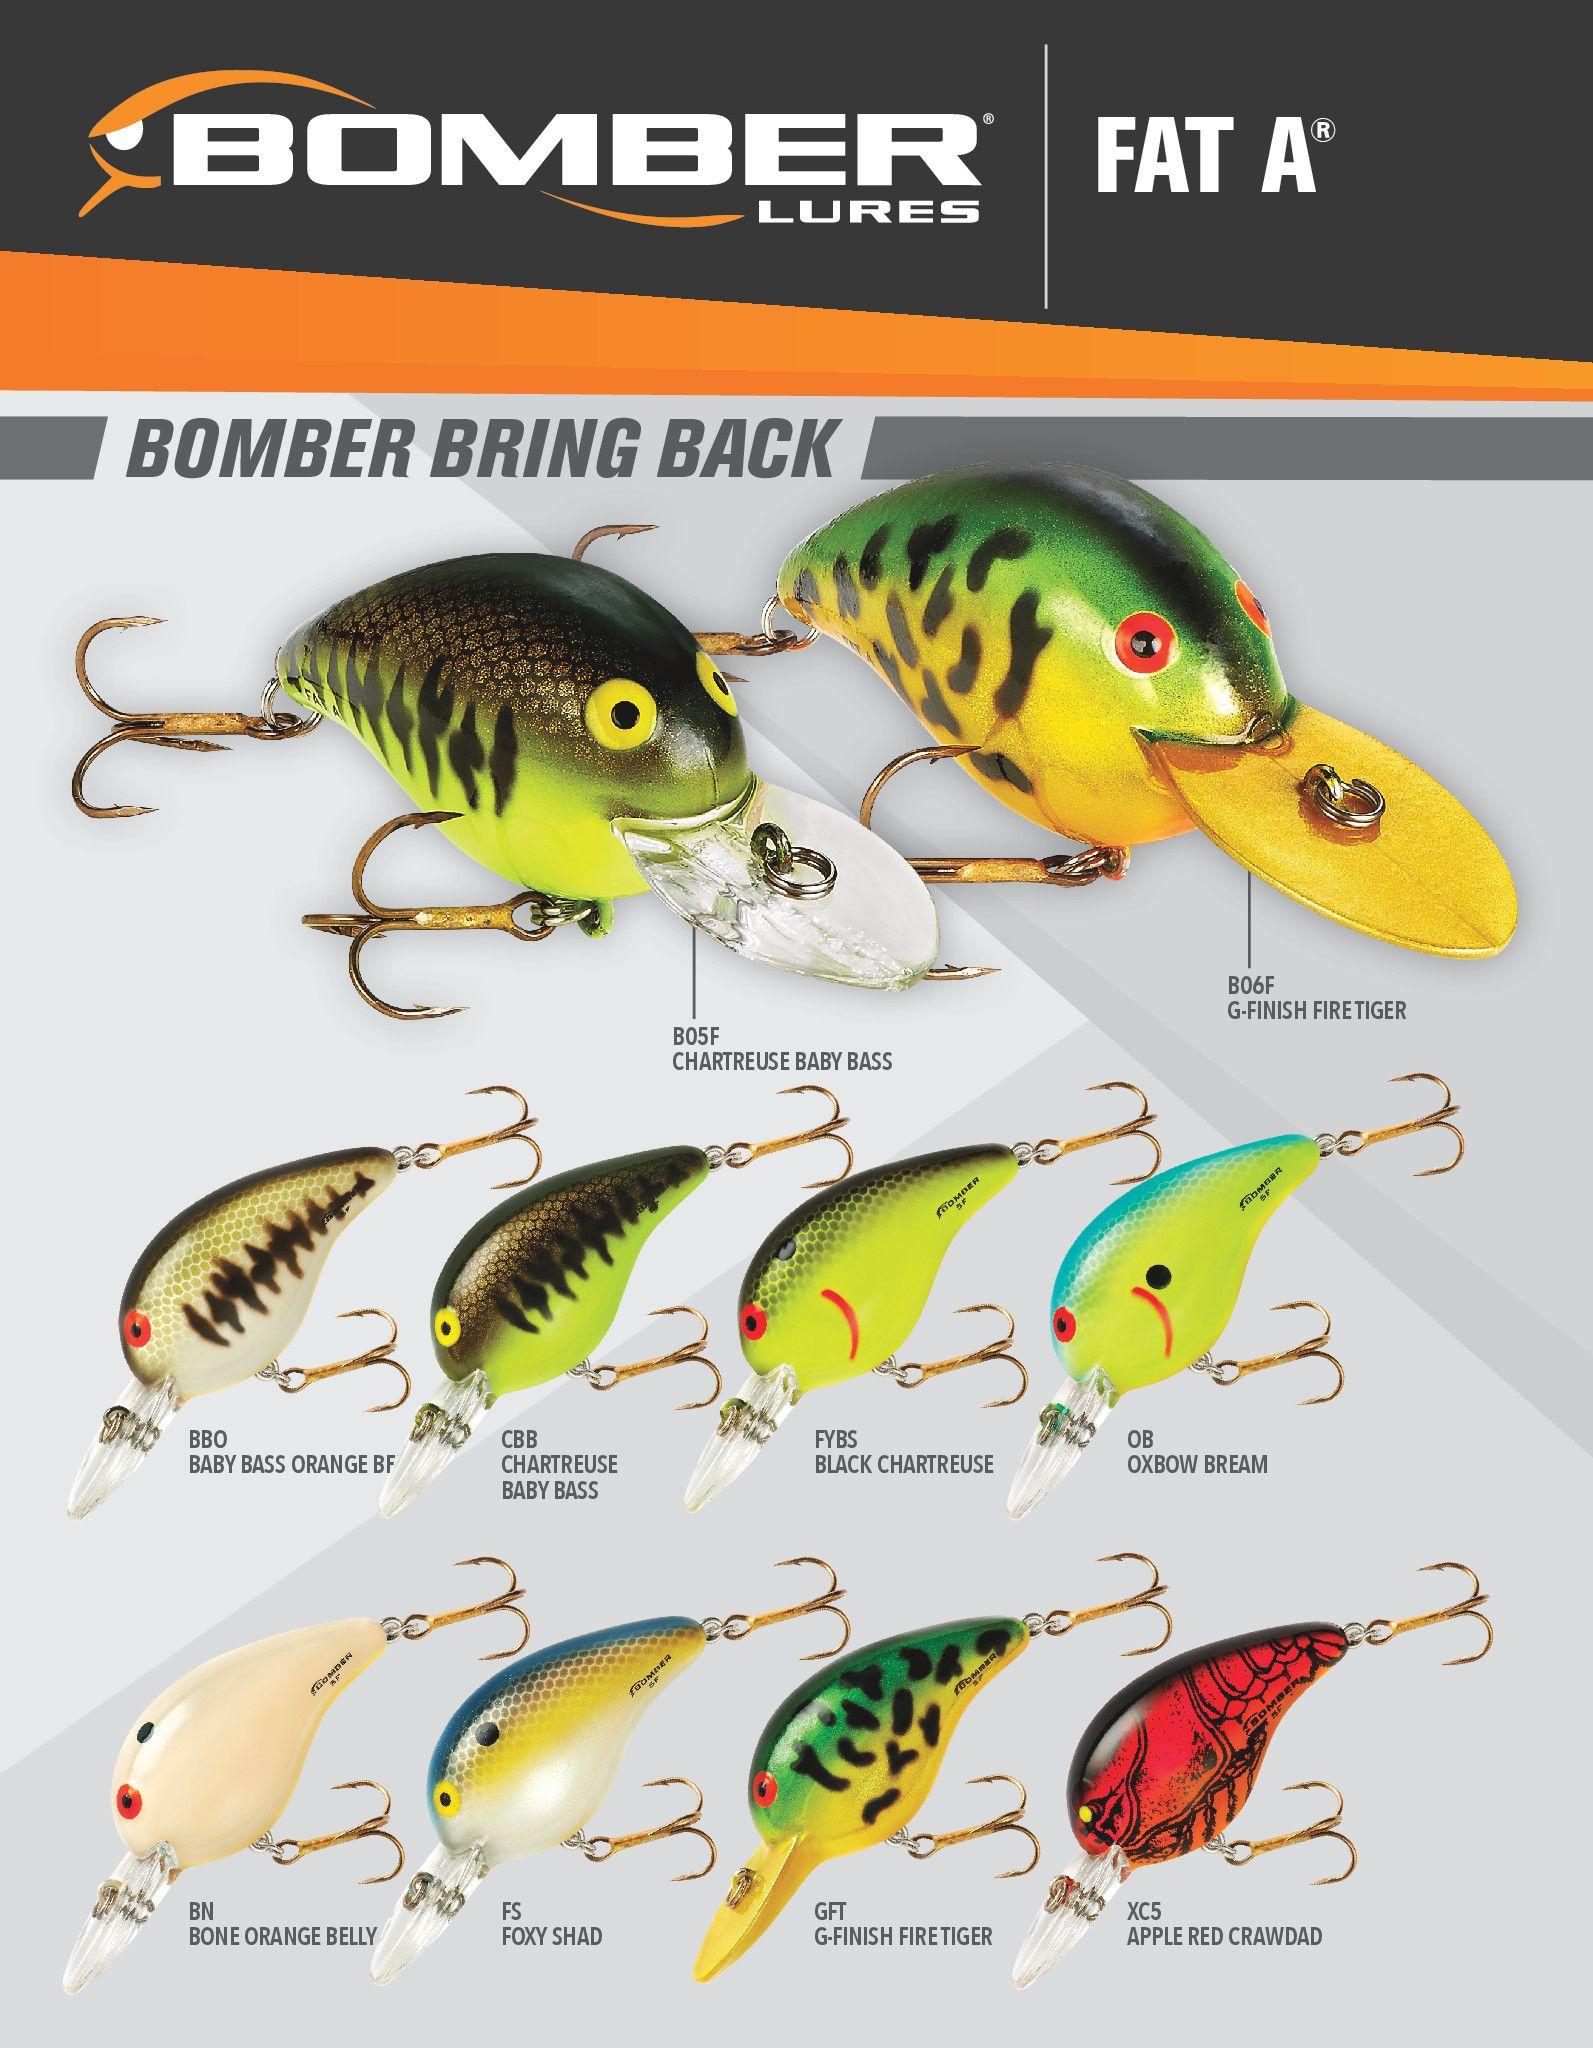 2018 bomber fat a color chart bass pinterest colour chart 2018 bomber fat a color chart fishing lurescolour nvjuhfo Gallery